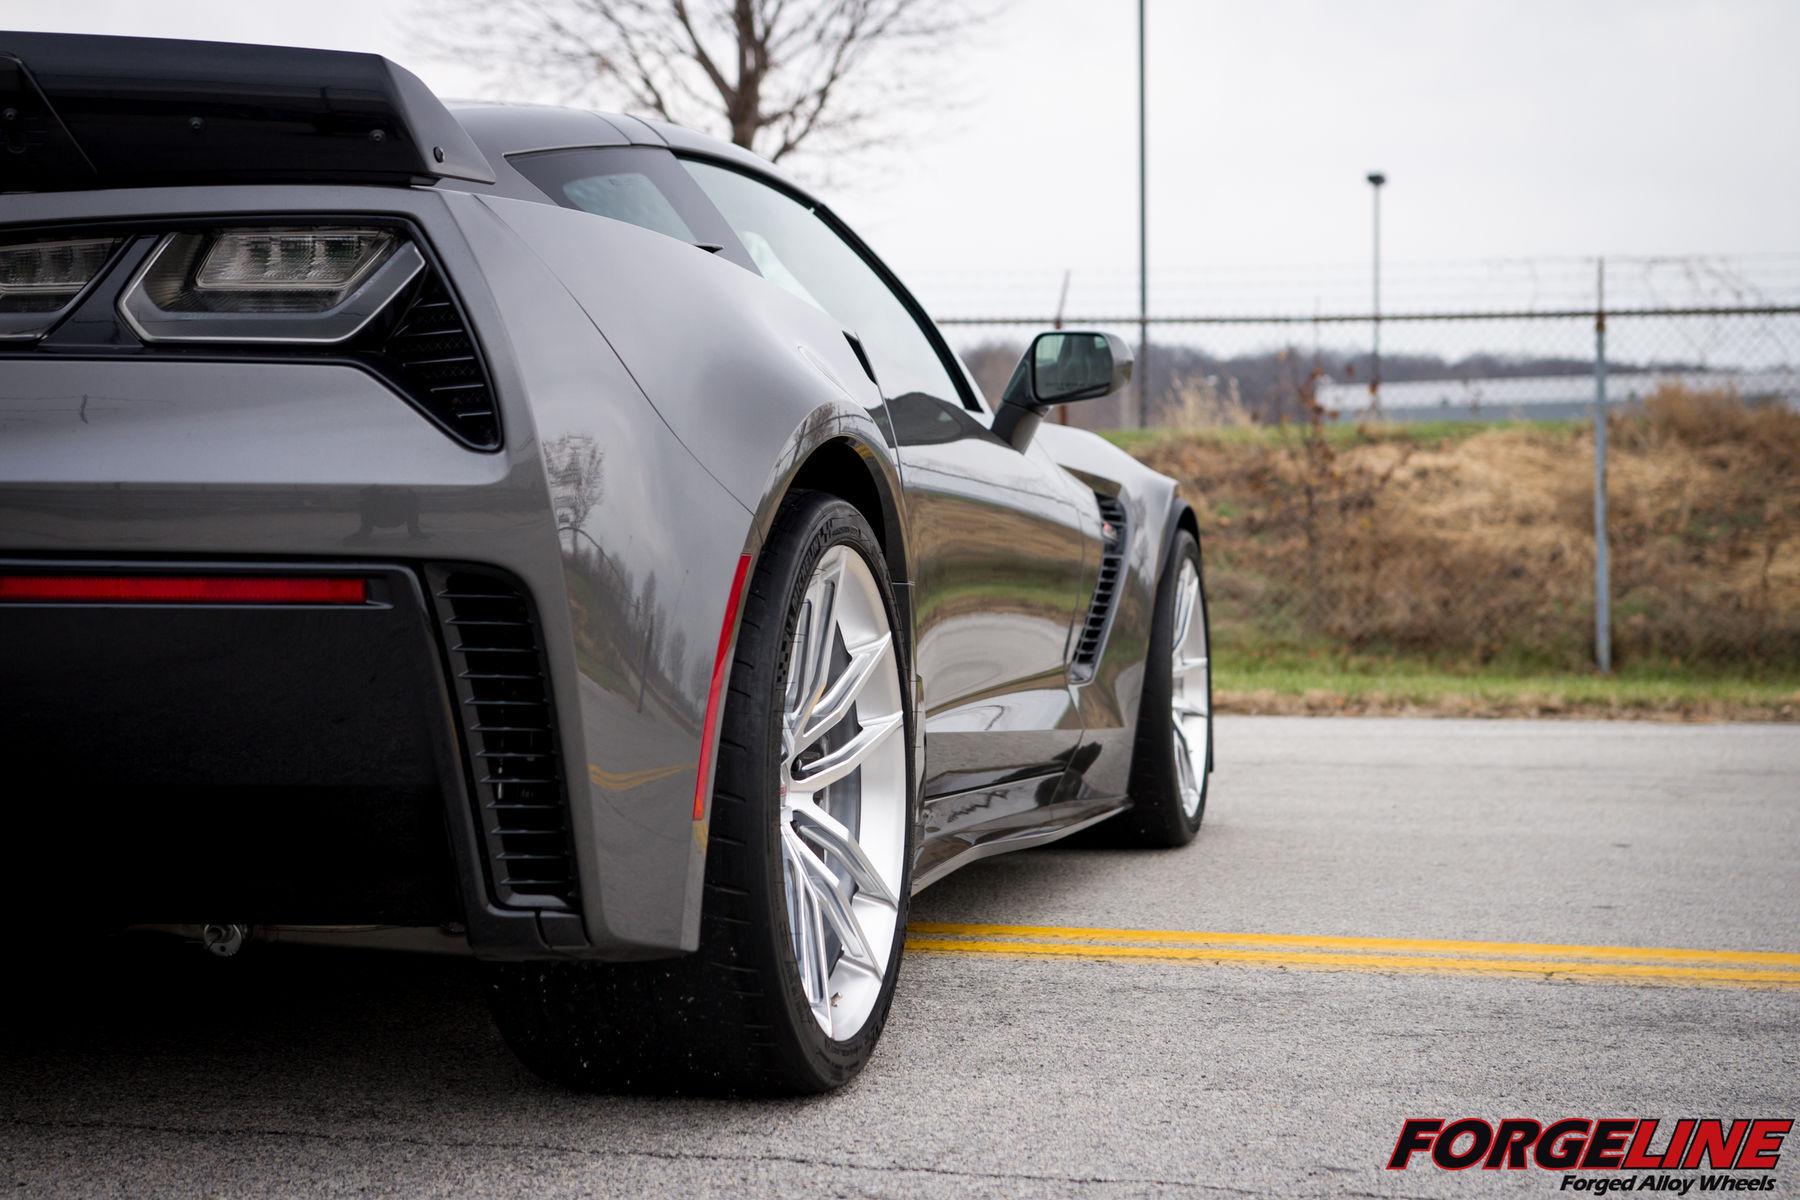 2015 Chevrolet Corvette Z06 | Forgeline's C7 Corvette Z06 on One Piece Forged Monoblock AR1 Wheels